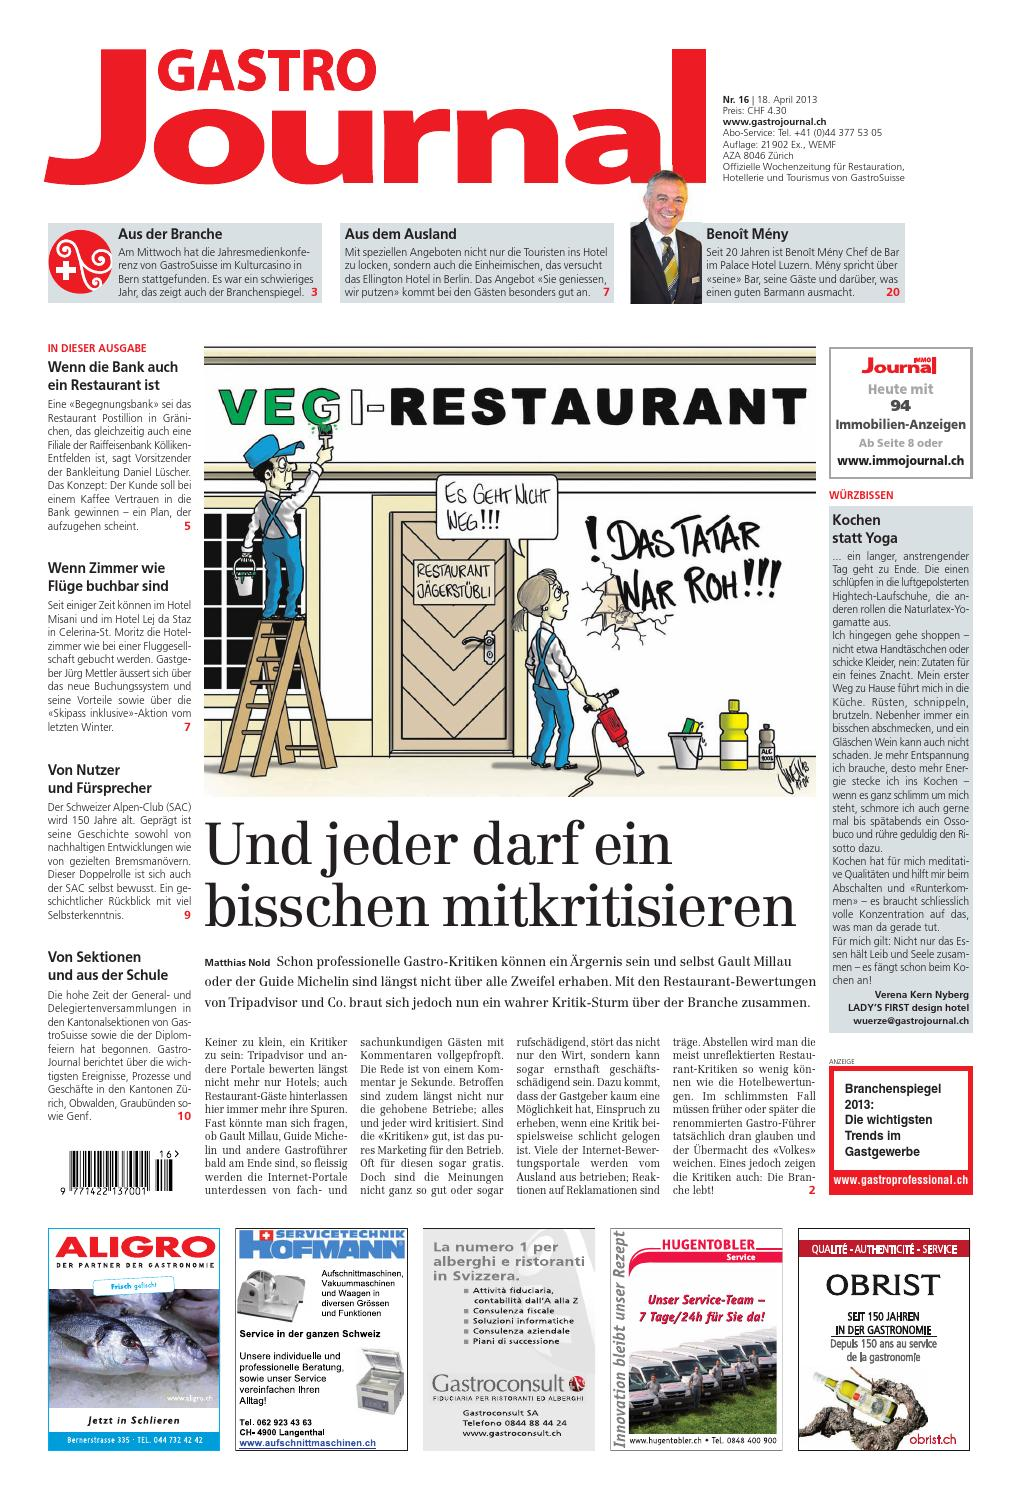 GastroJournal 16 2013 By Gastrojournal